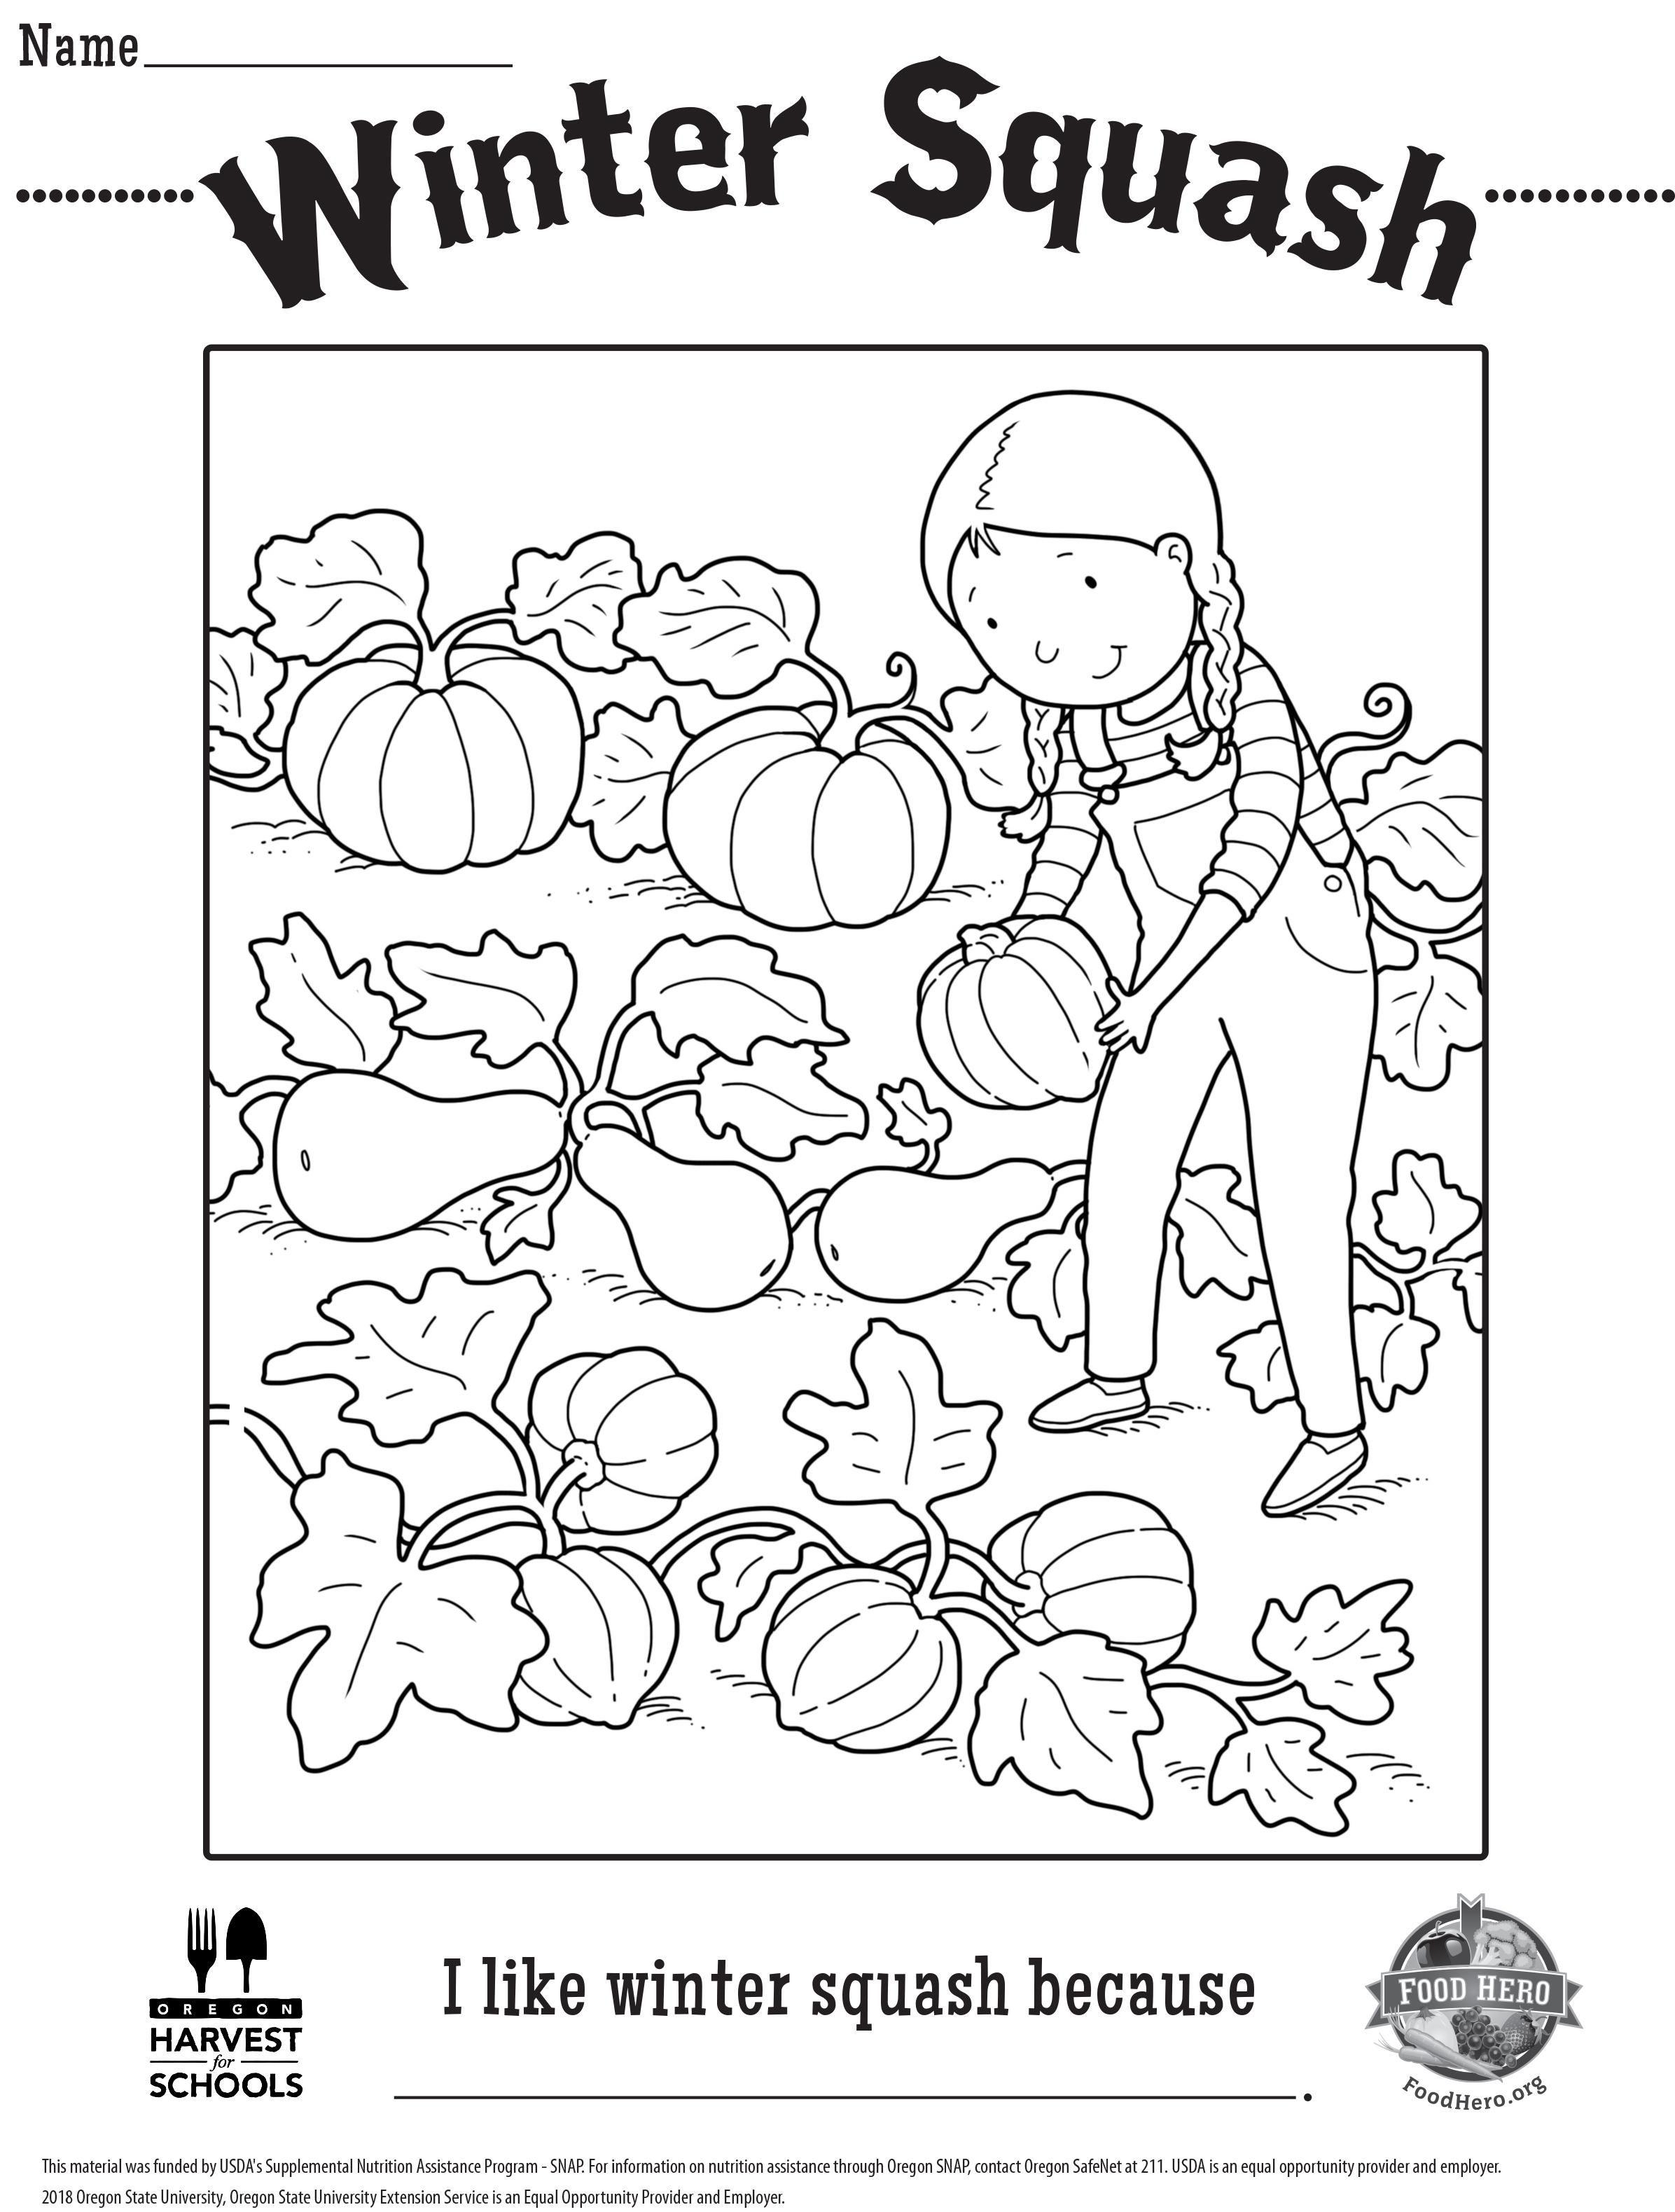 Free Coloring Sheet Winter Squash Coloring Sheets Free Coloring Sheets Winter